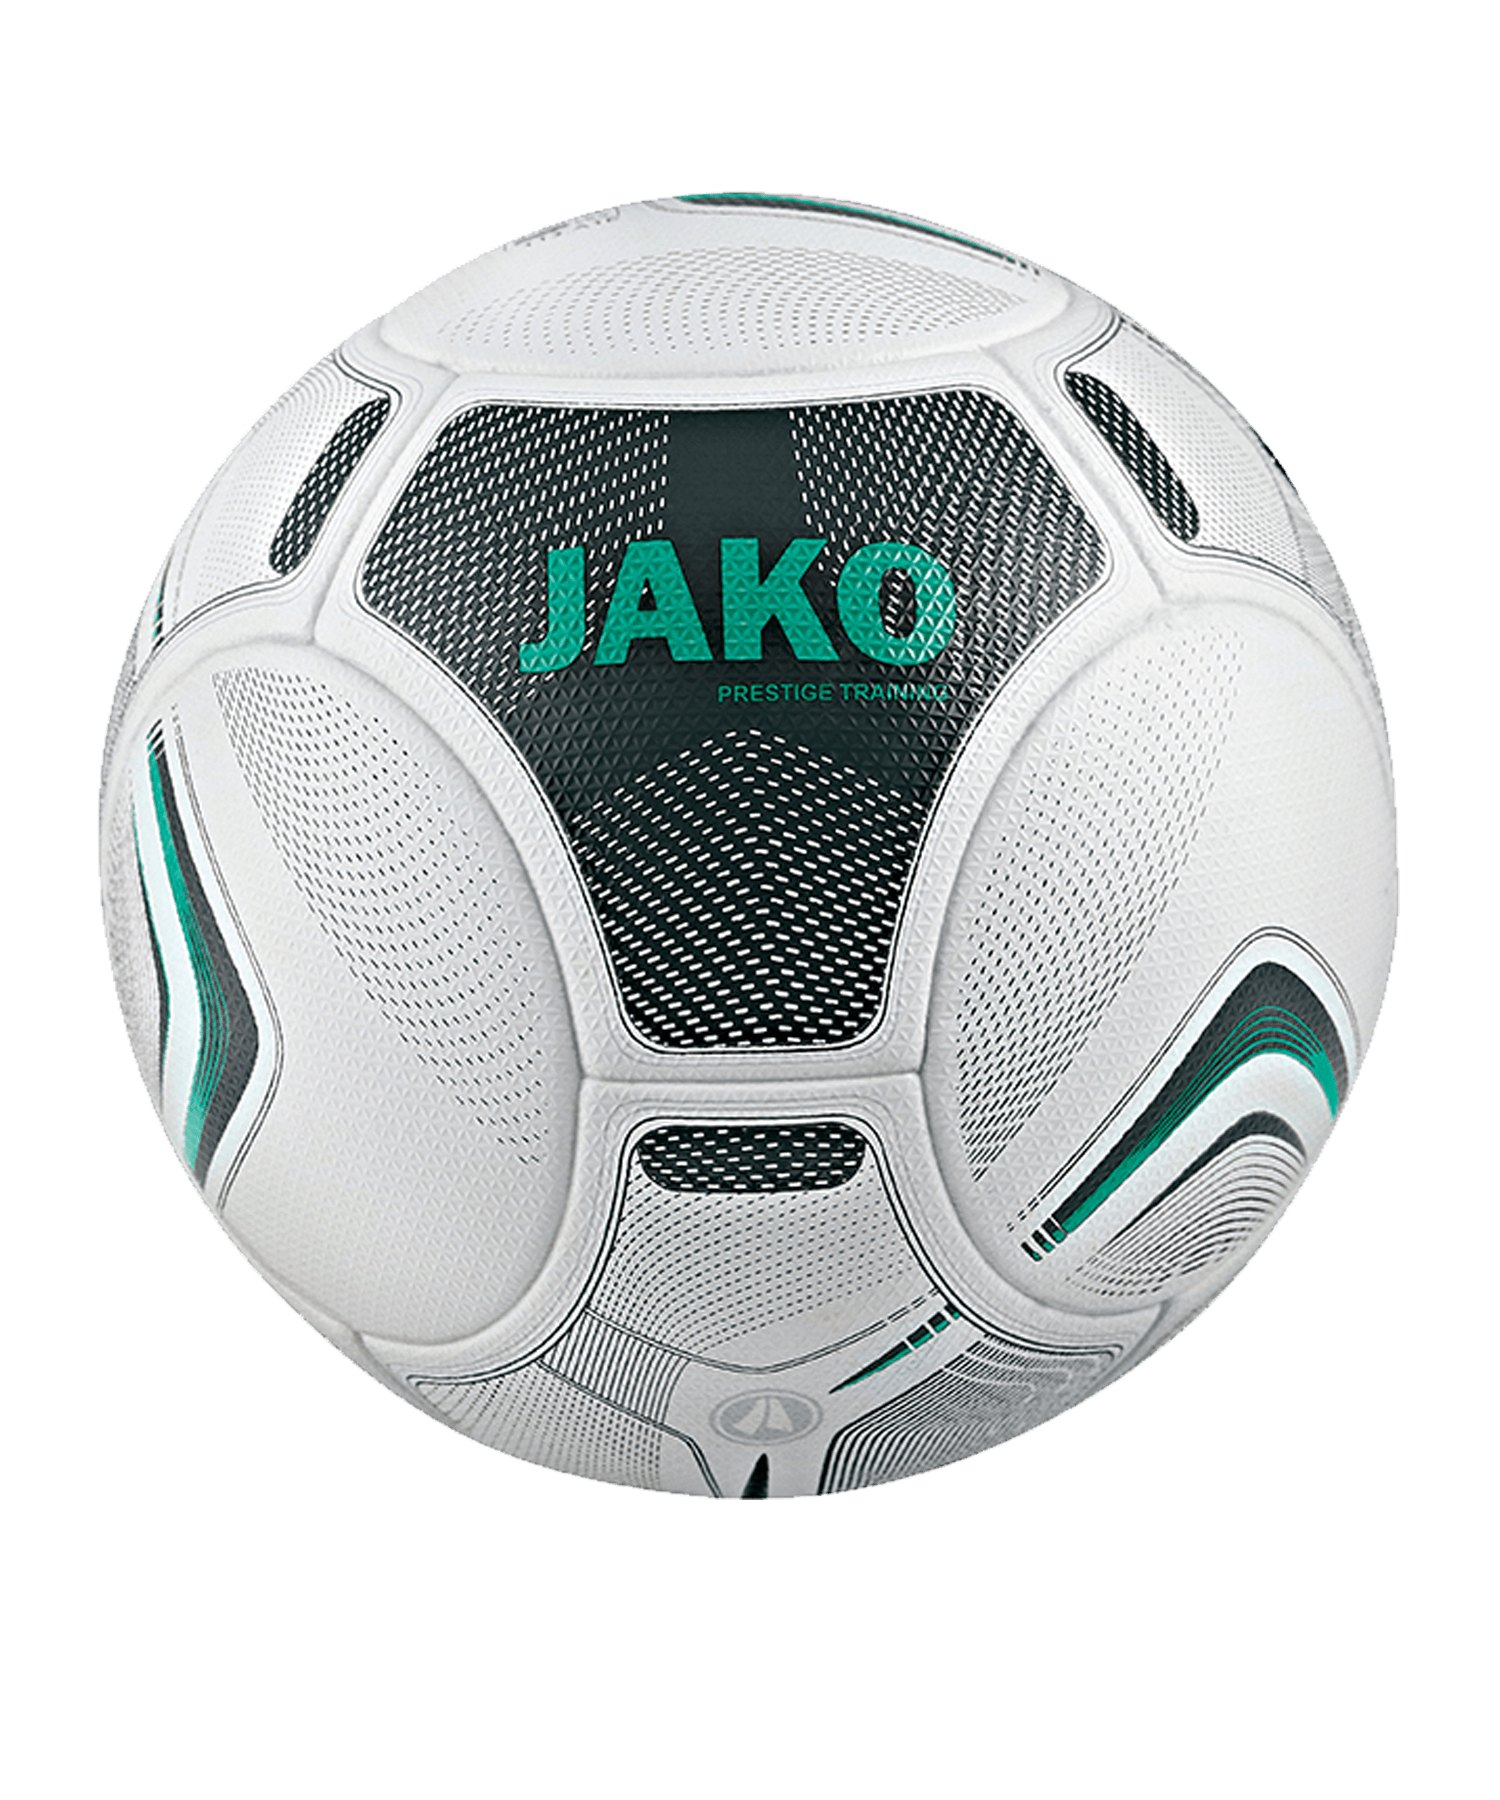 JAKO Prestige Trainingsball Weiss F24 - weiss